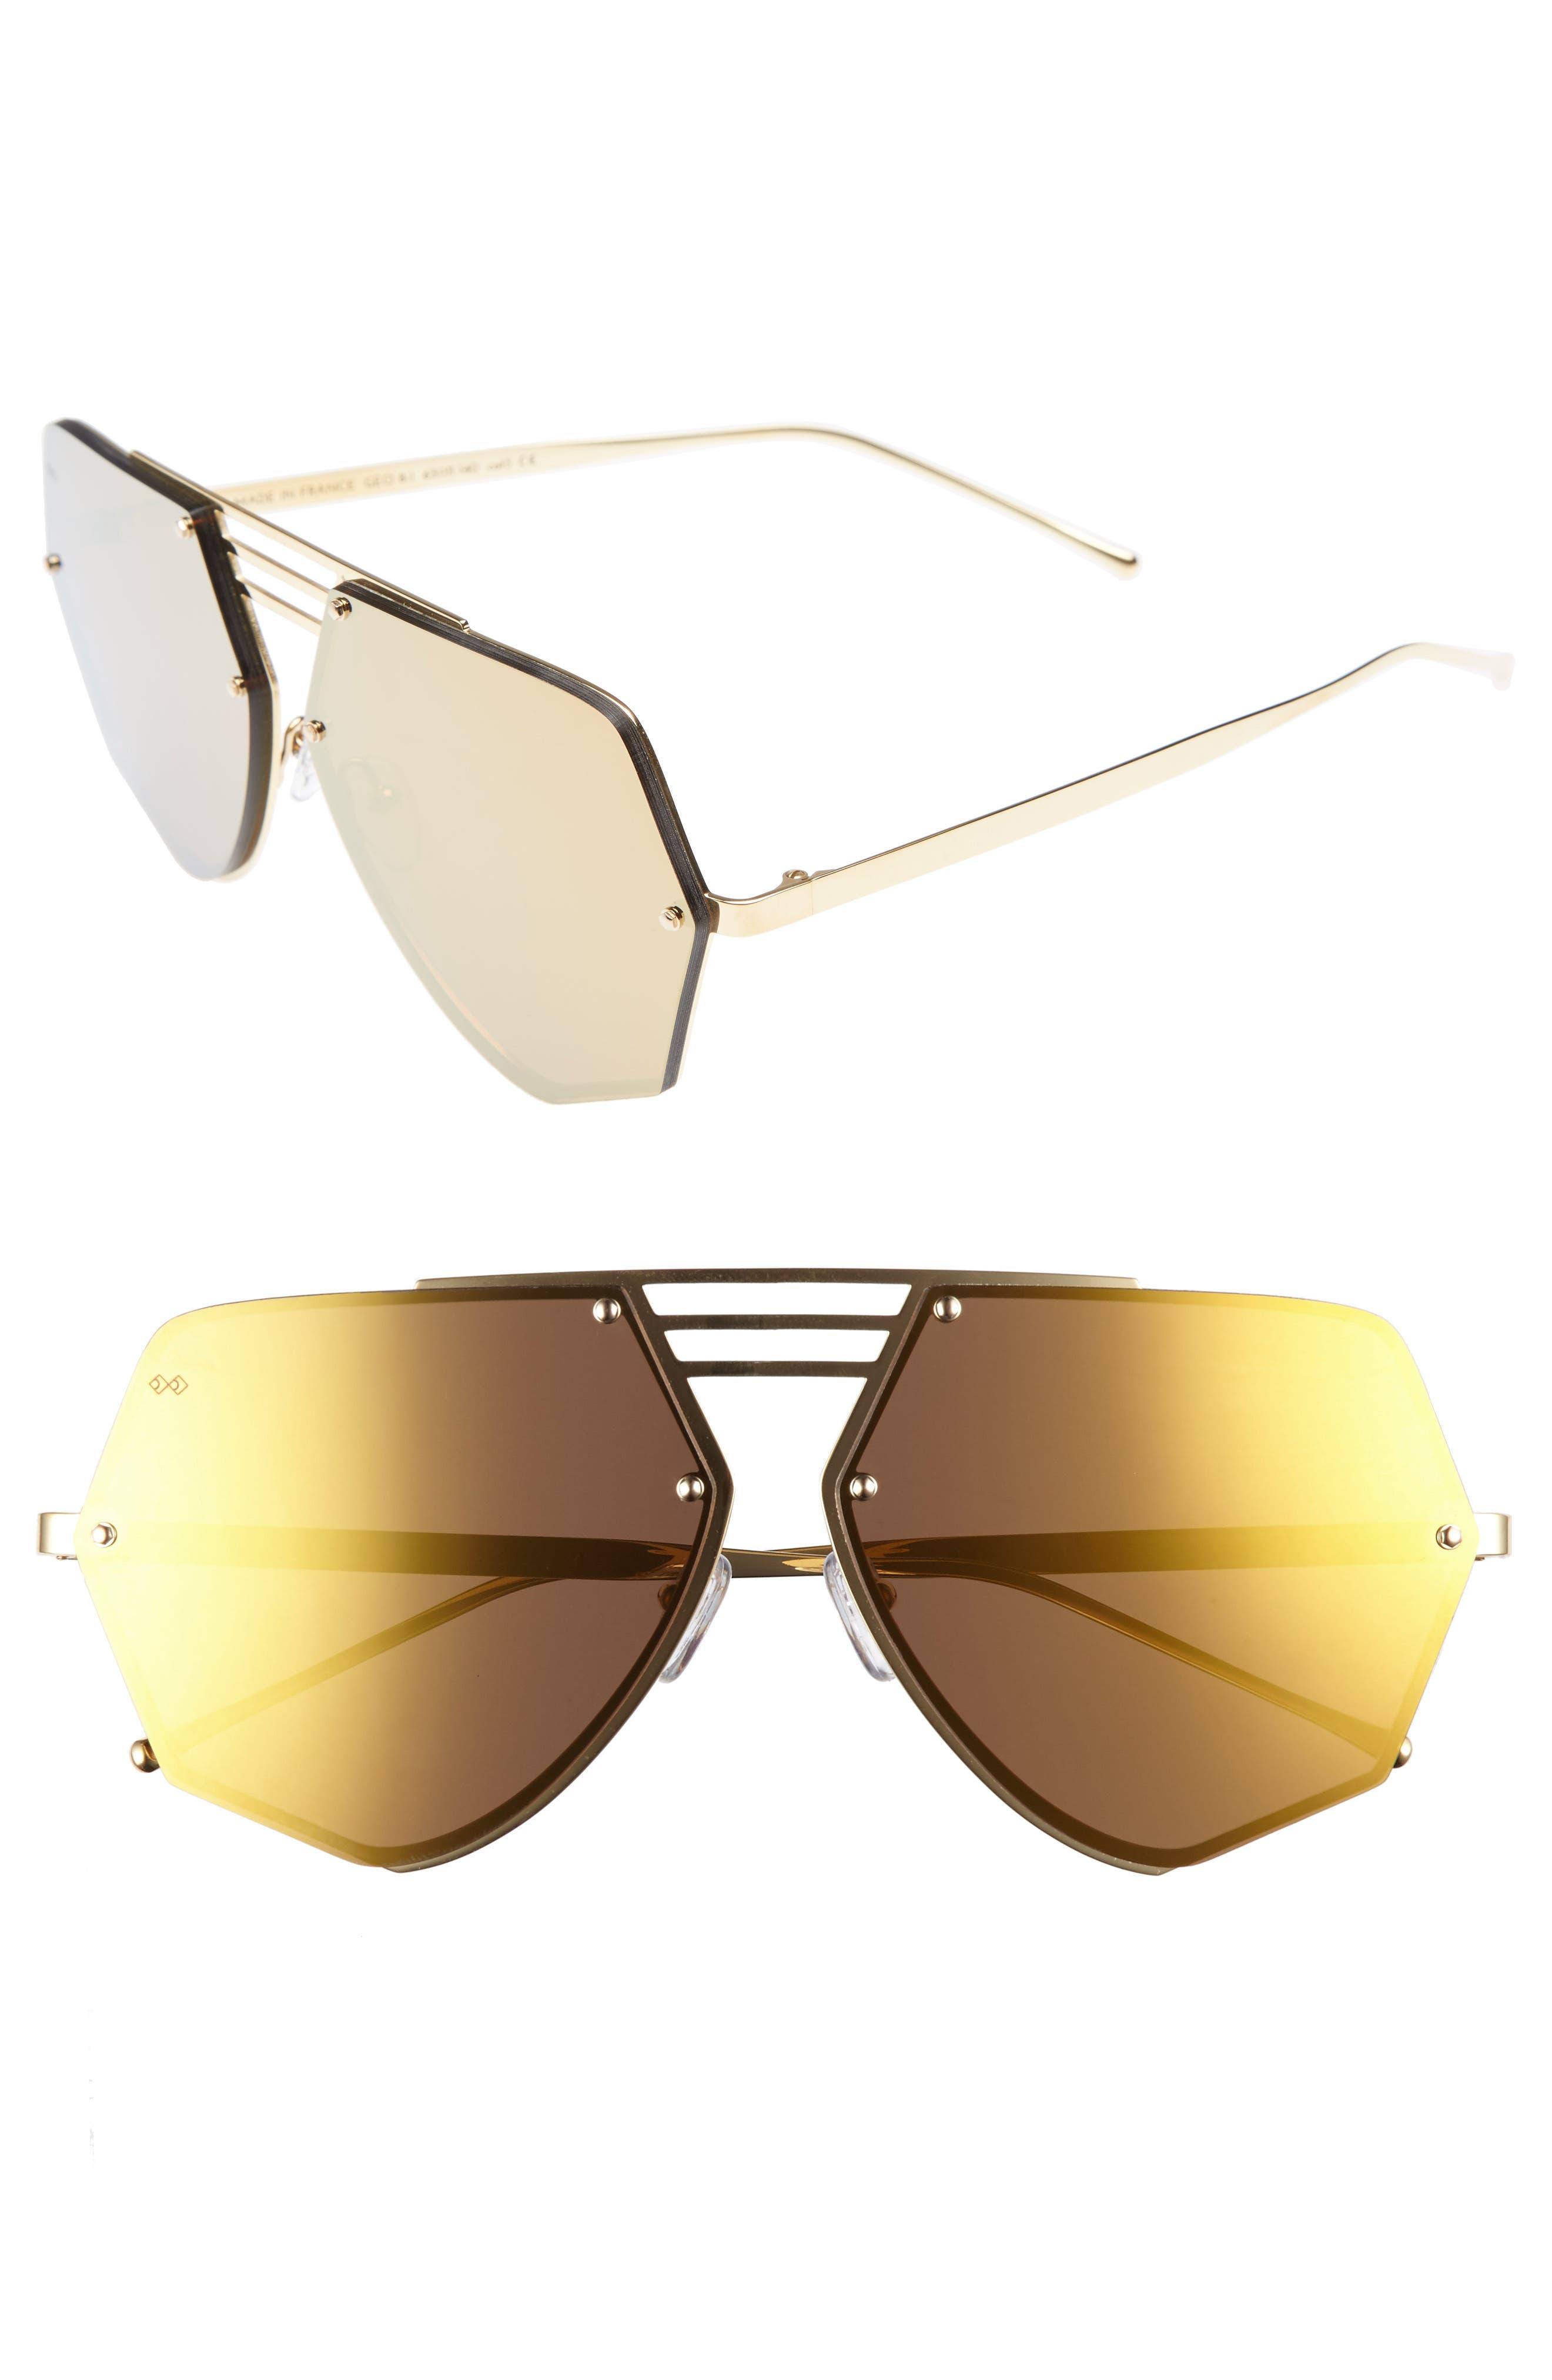 Geo 8 63mm Mirrored Sunglasses,                         Main,                         color, 712